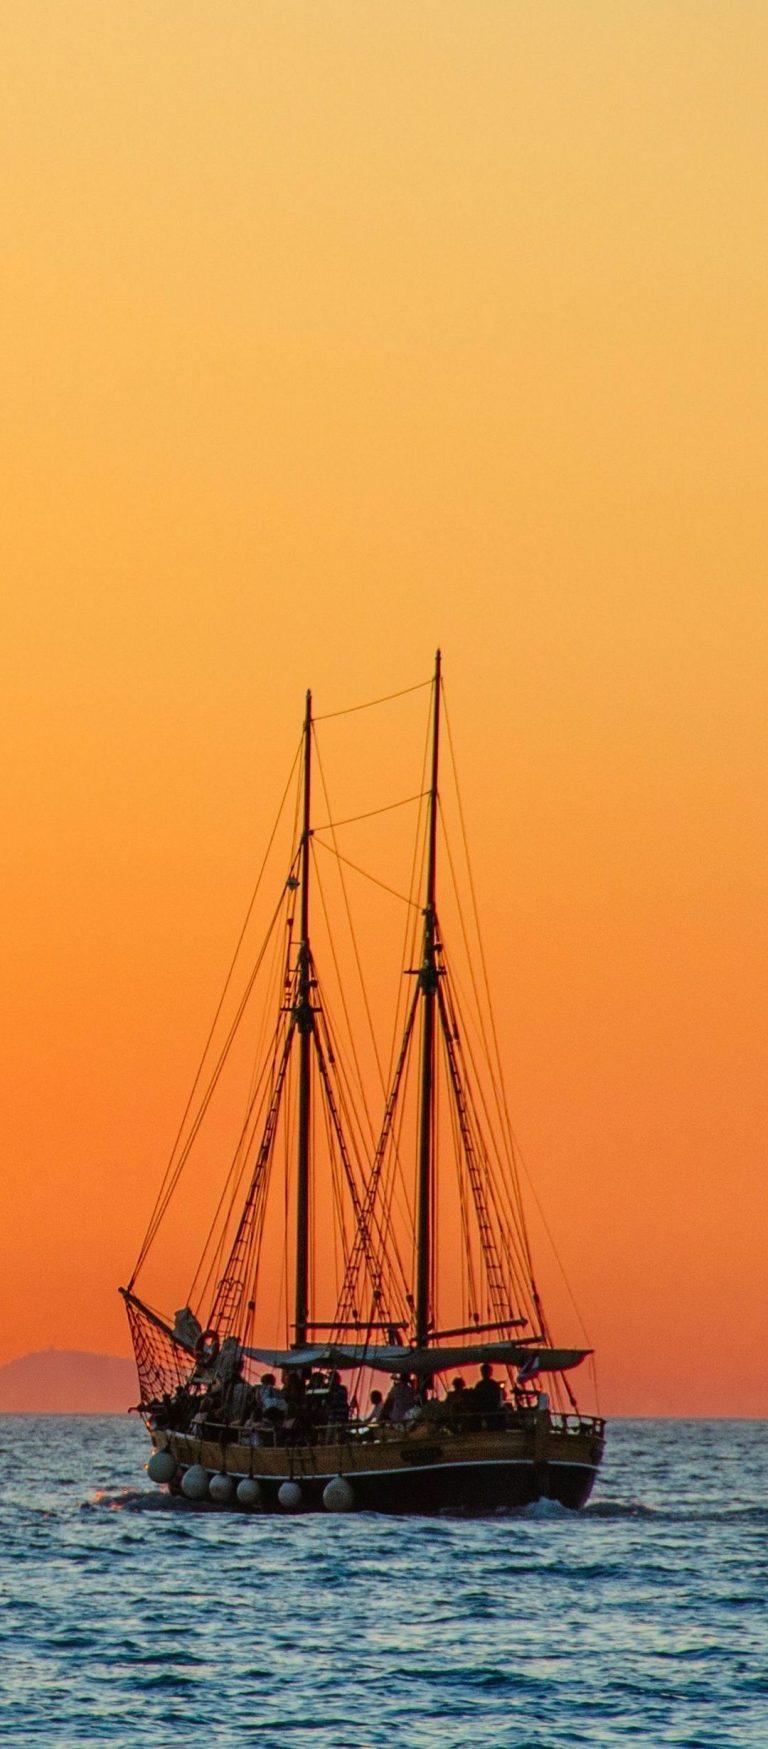 Sea Sailboat Horizon 1080x2460 768x1749